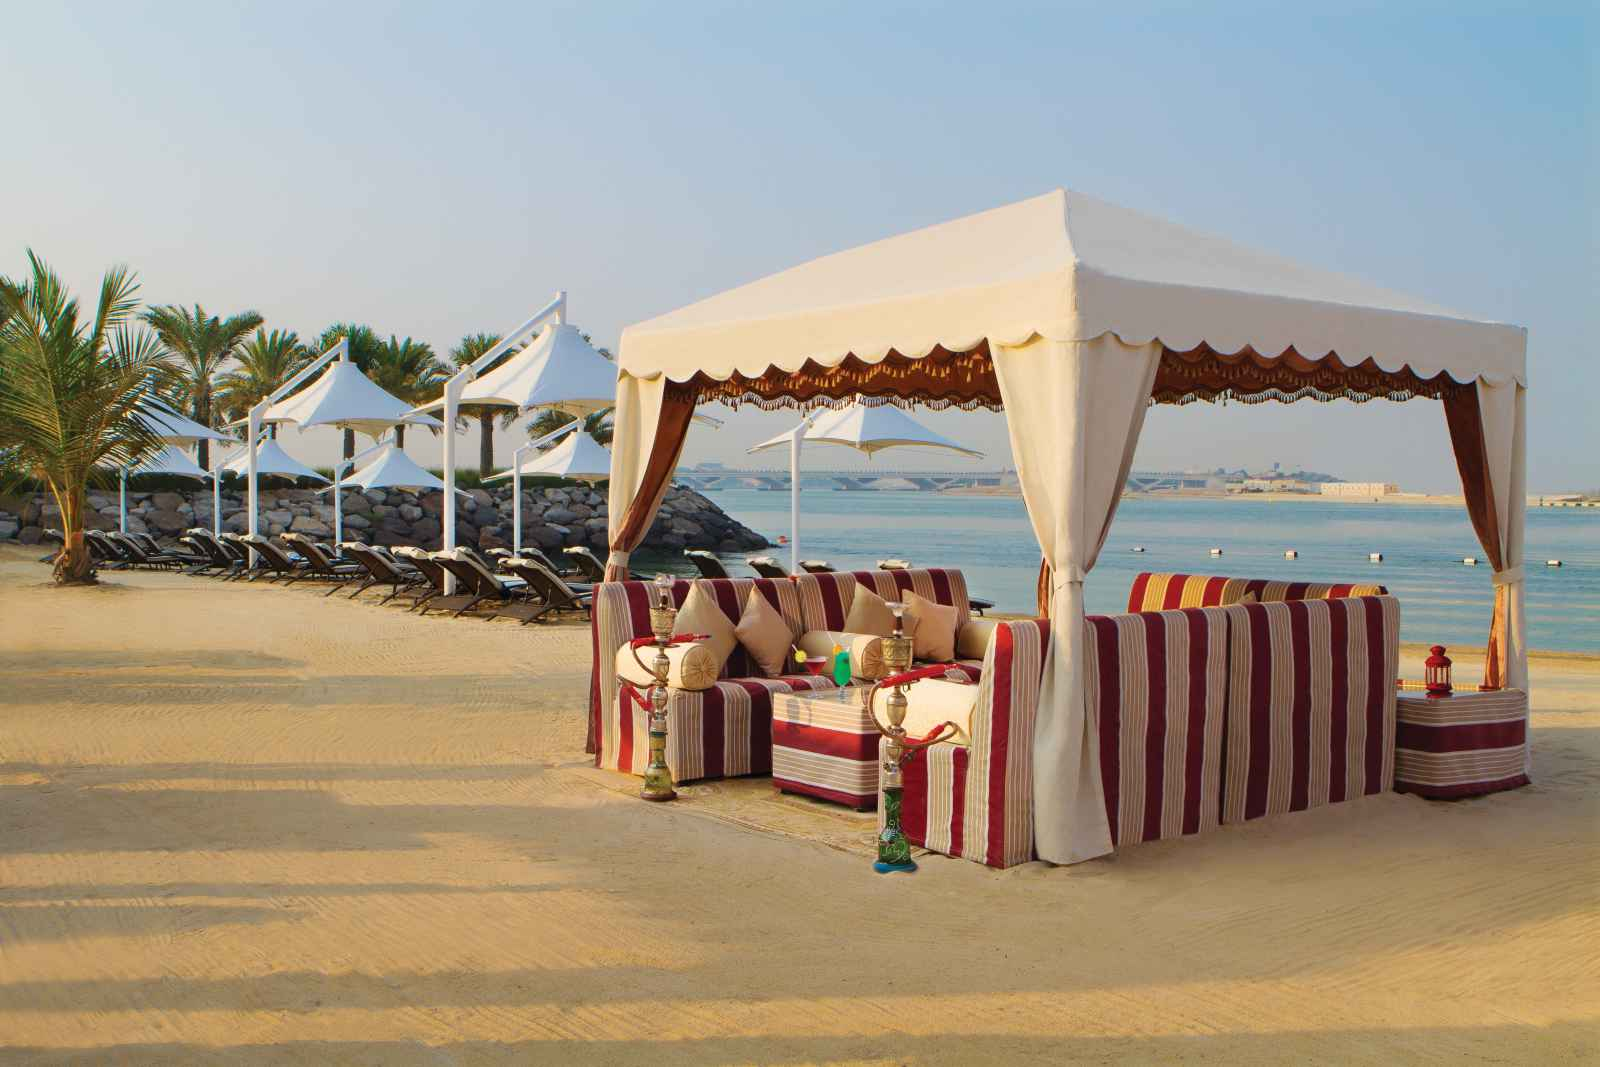 Abou Dhabi : Traders Hotel, Qaryat Al Beri